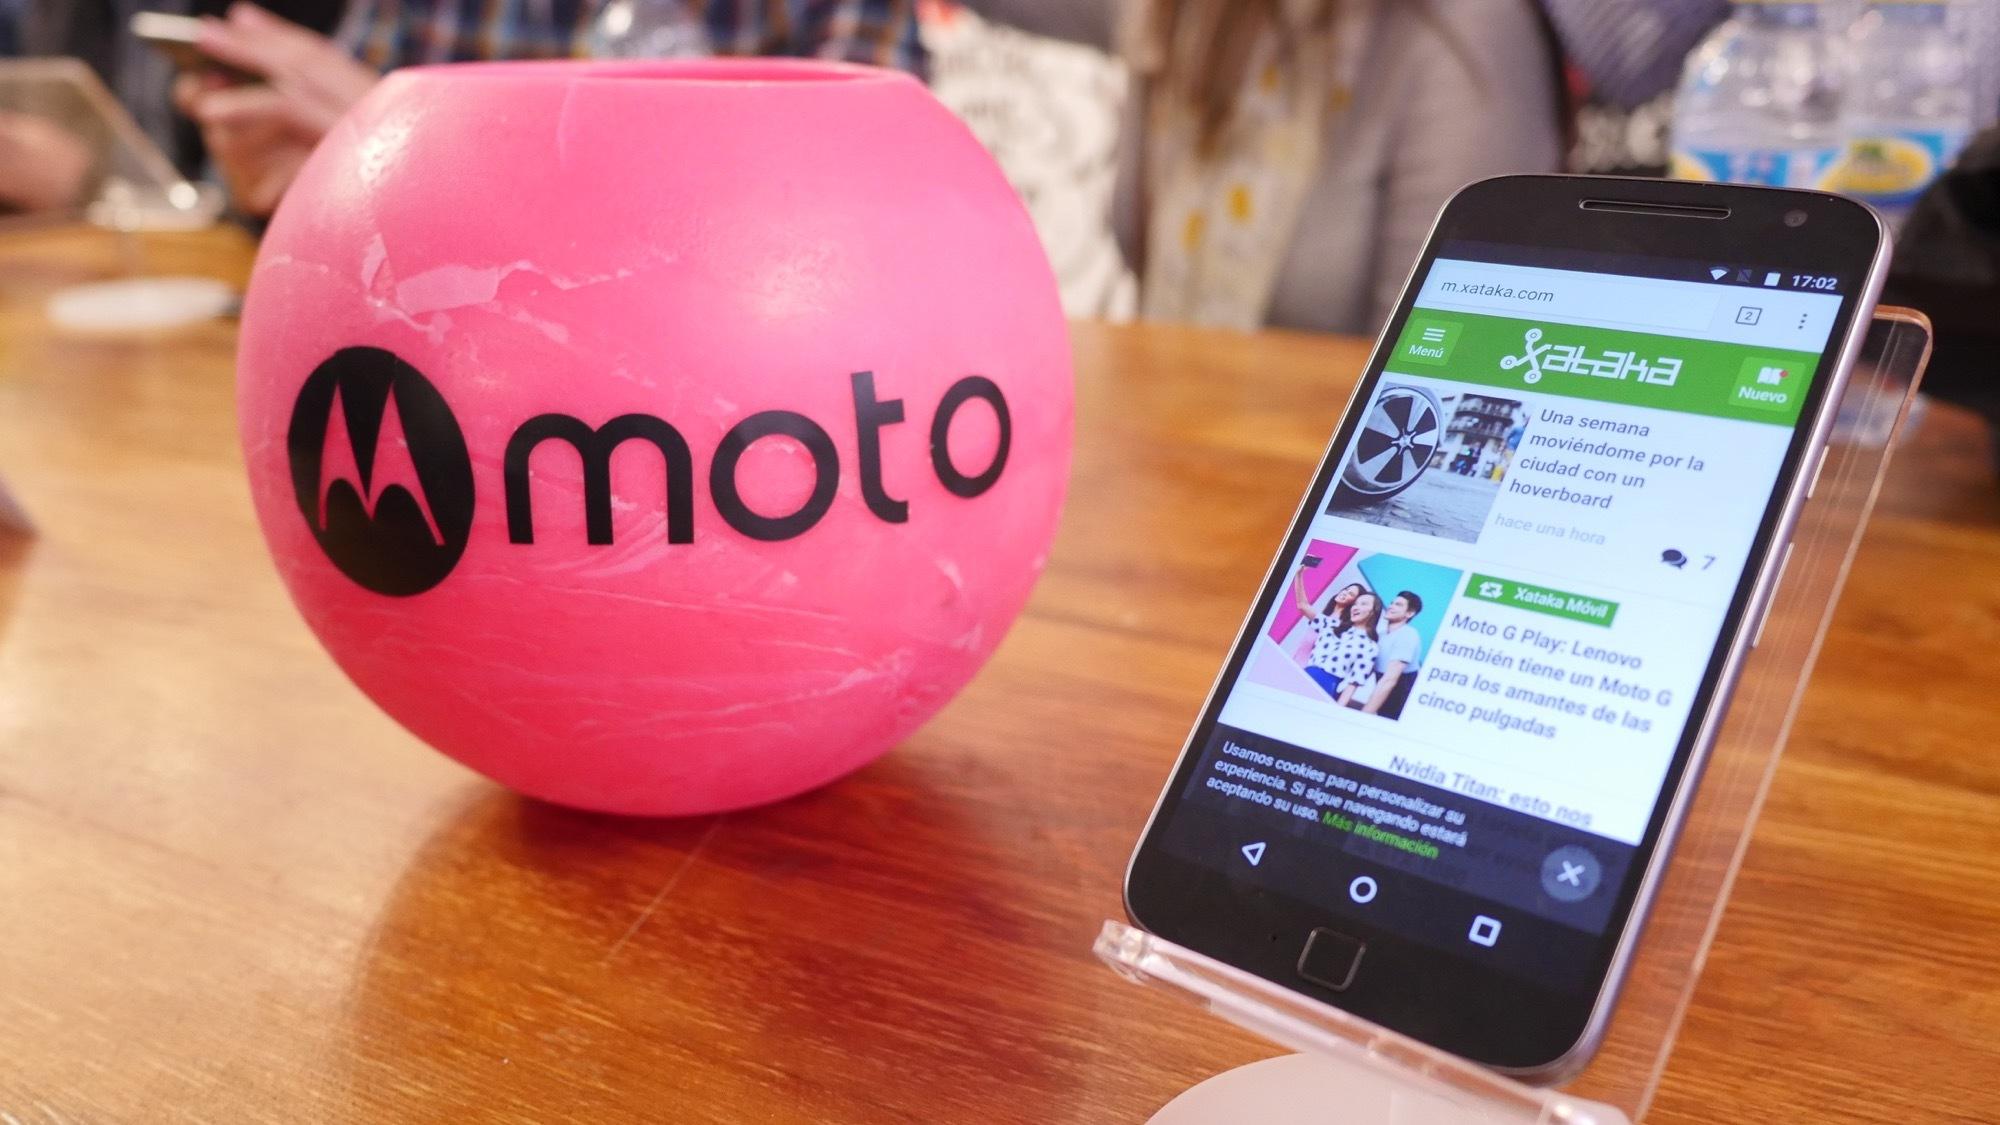 Foto de Motorola Moto G (4ª gen) y Moto G Plus (10/14)